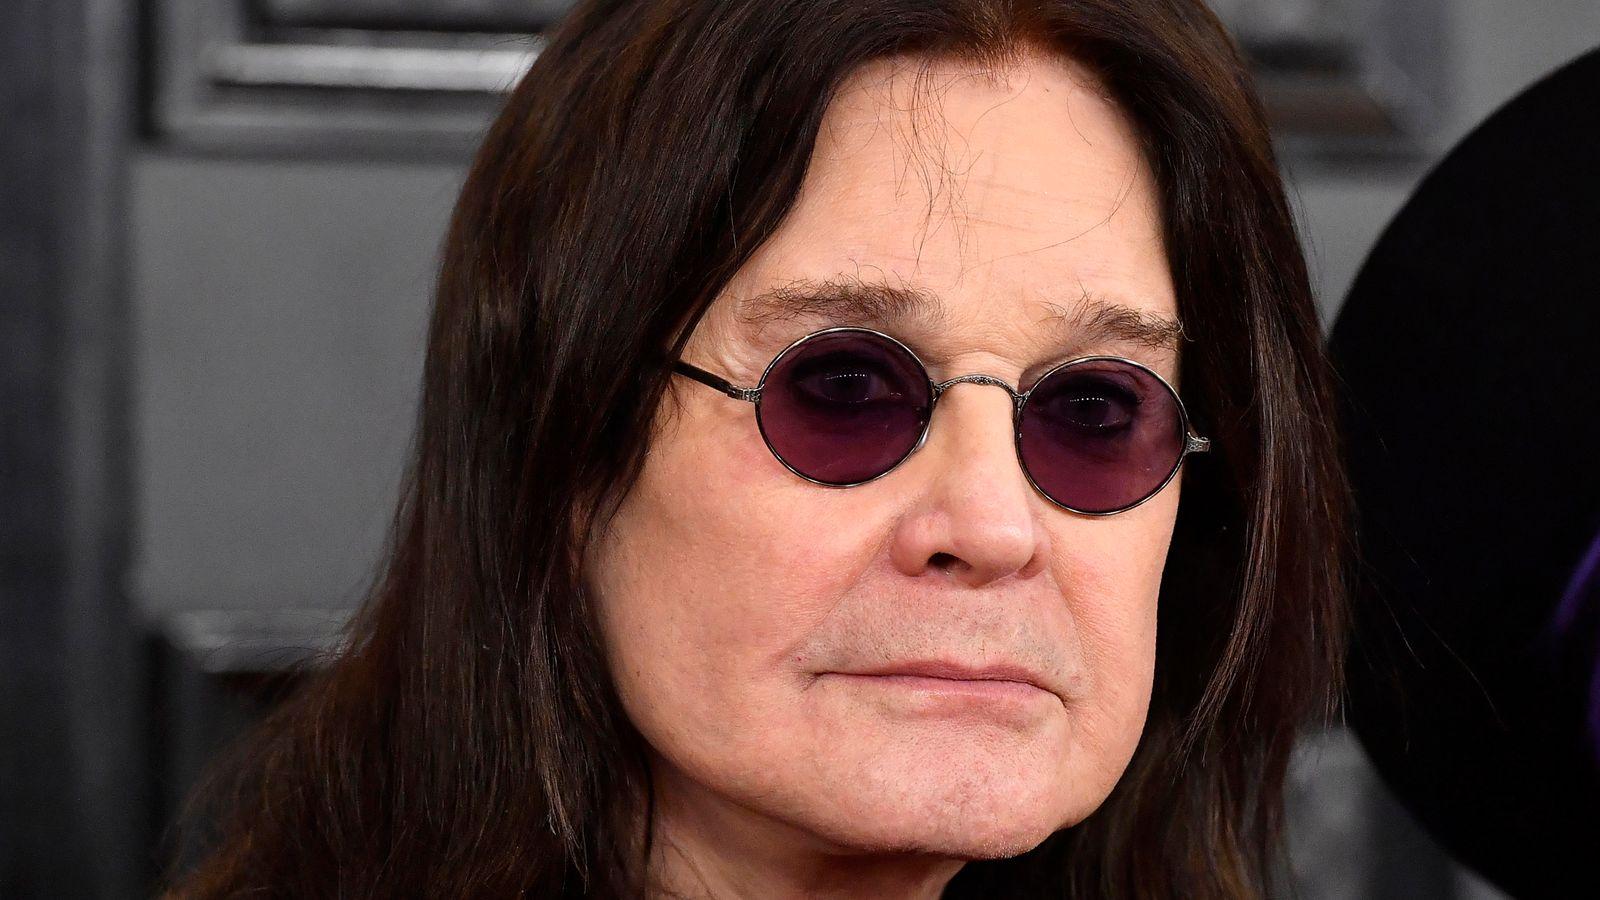 Ozzy Osbourne cancels US tour to receive Parkinson's treatment in Switzerland